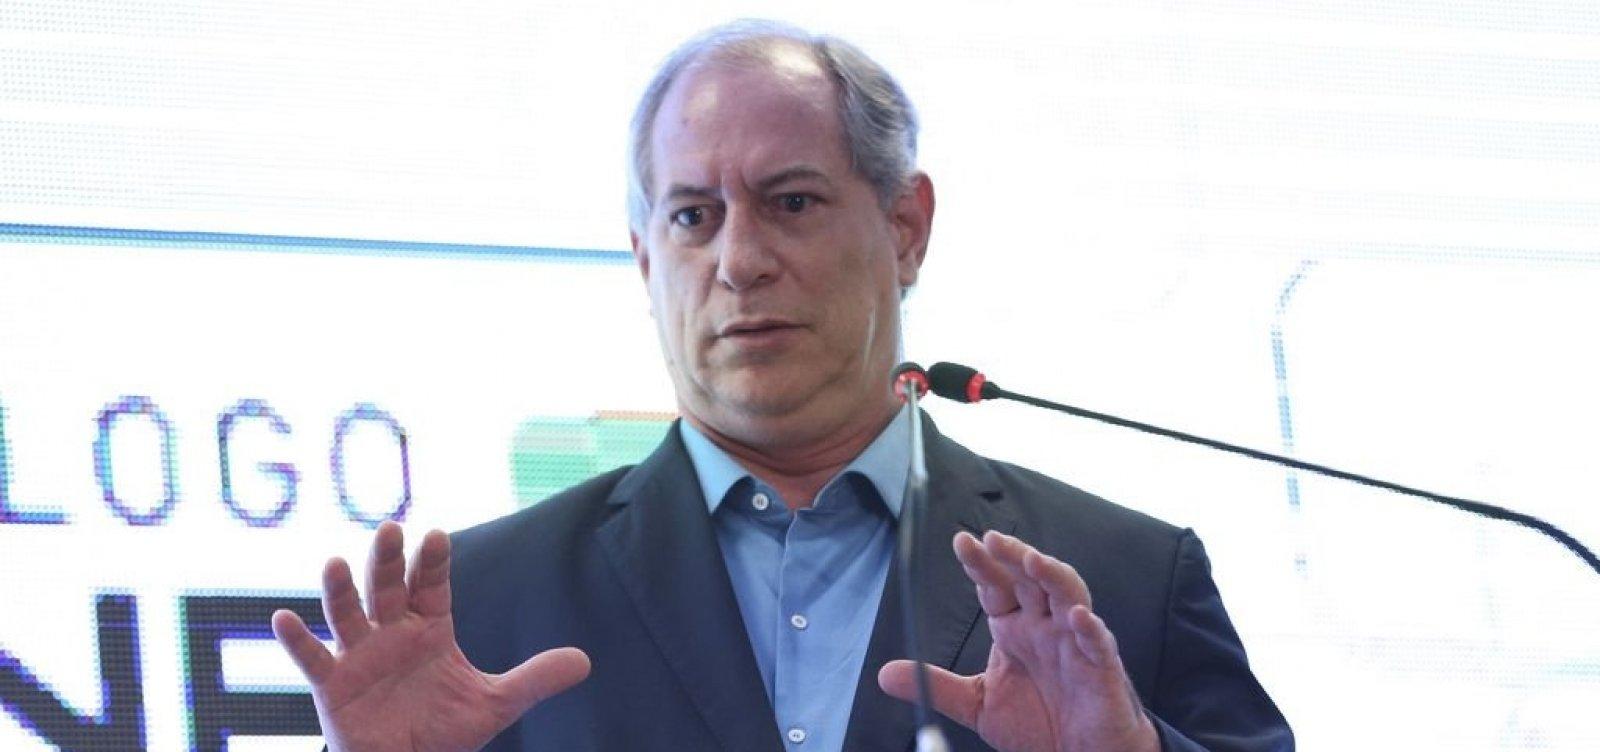 Comunidade judaica processa Ciro Gomes por antissemitismo